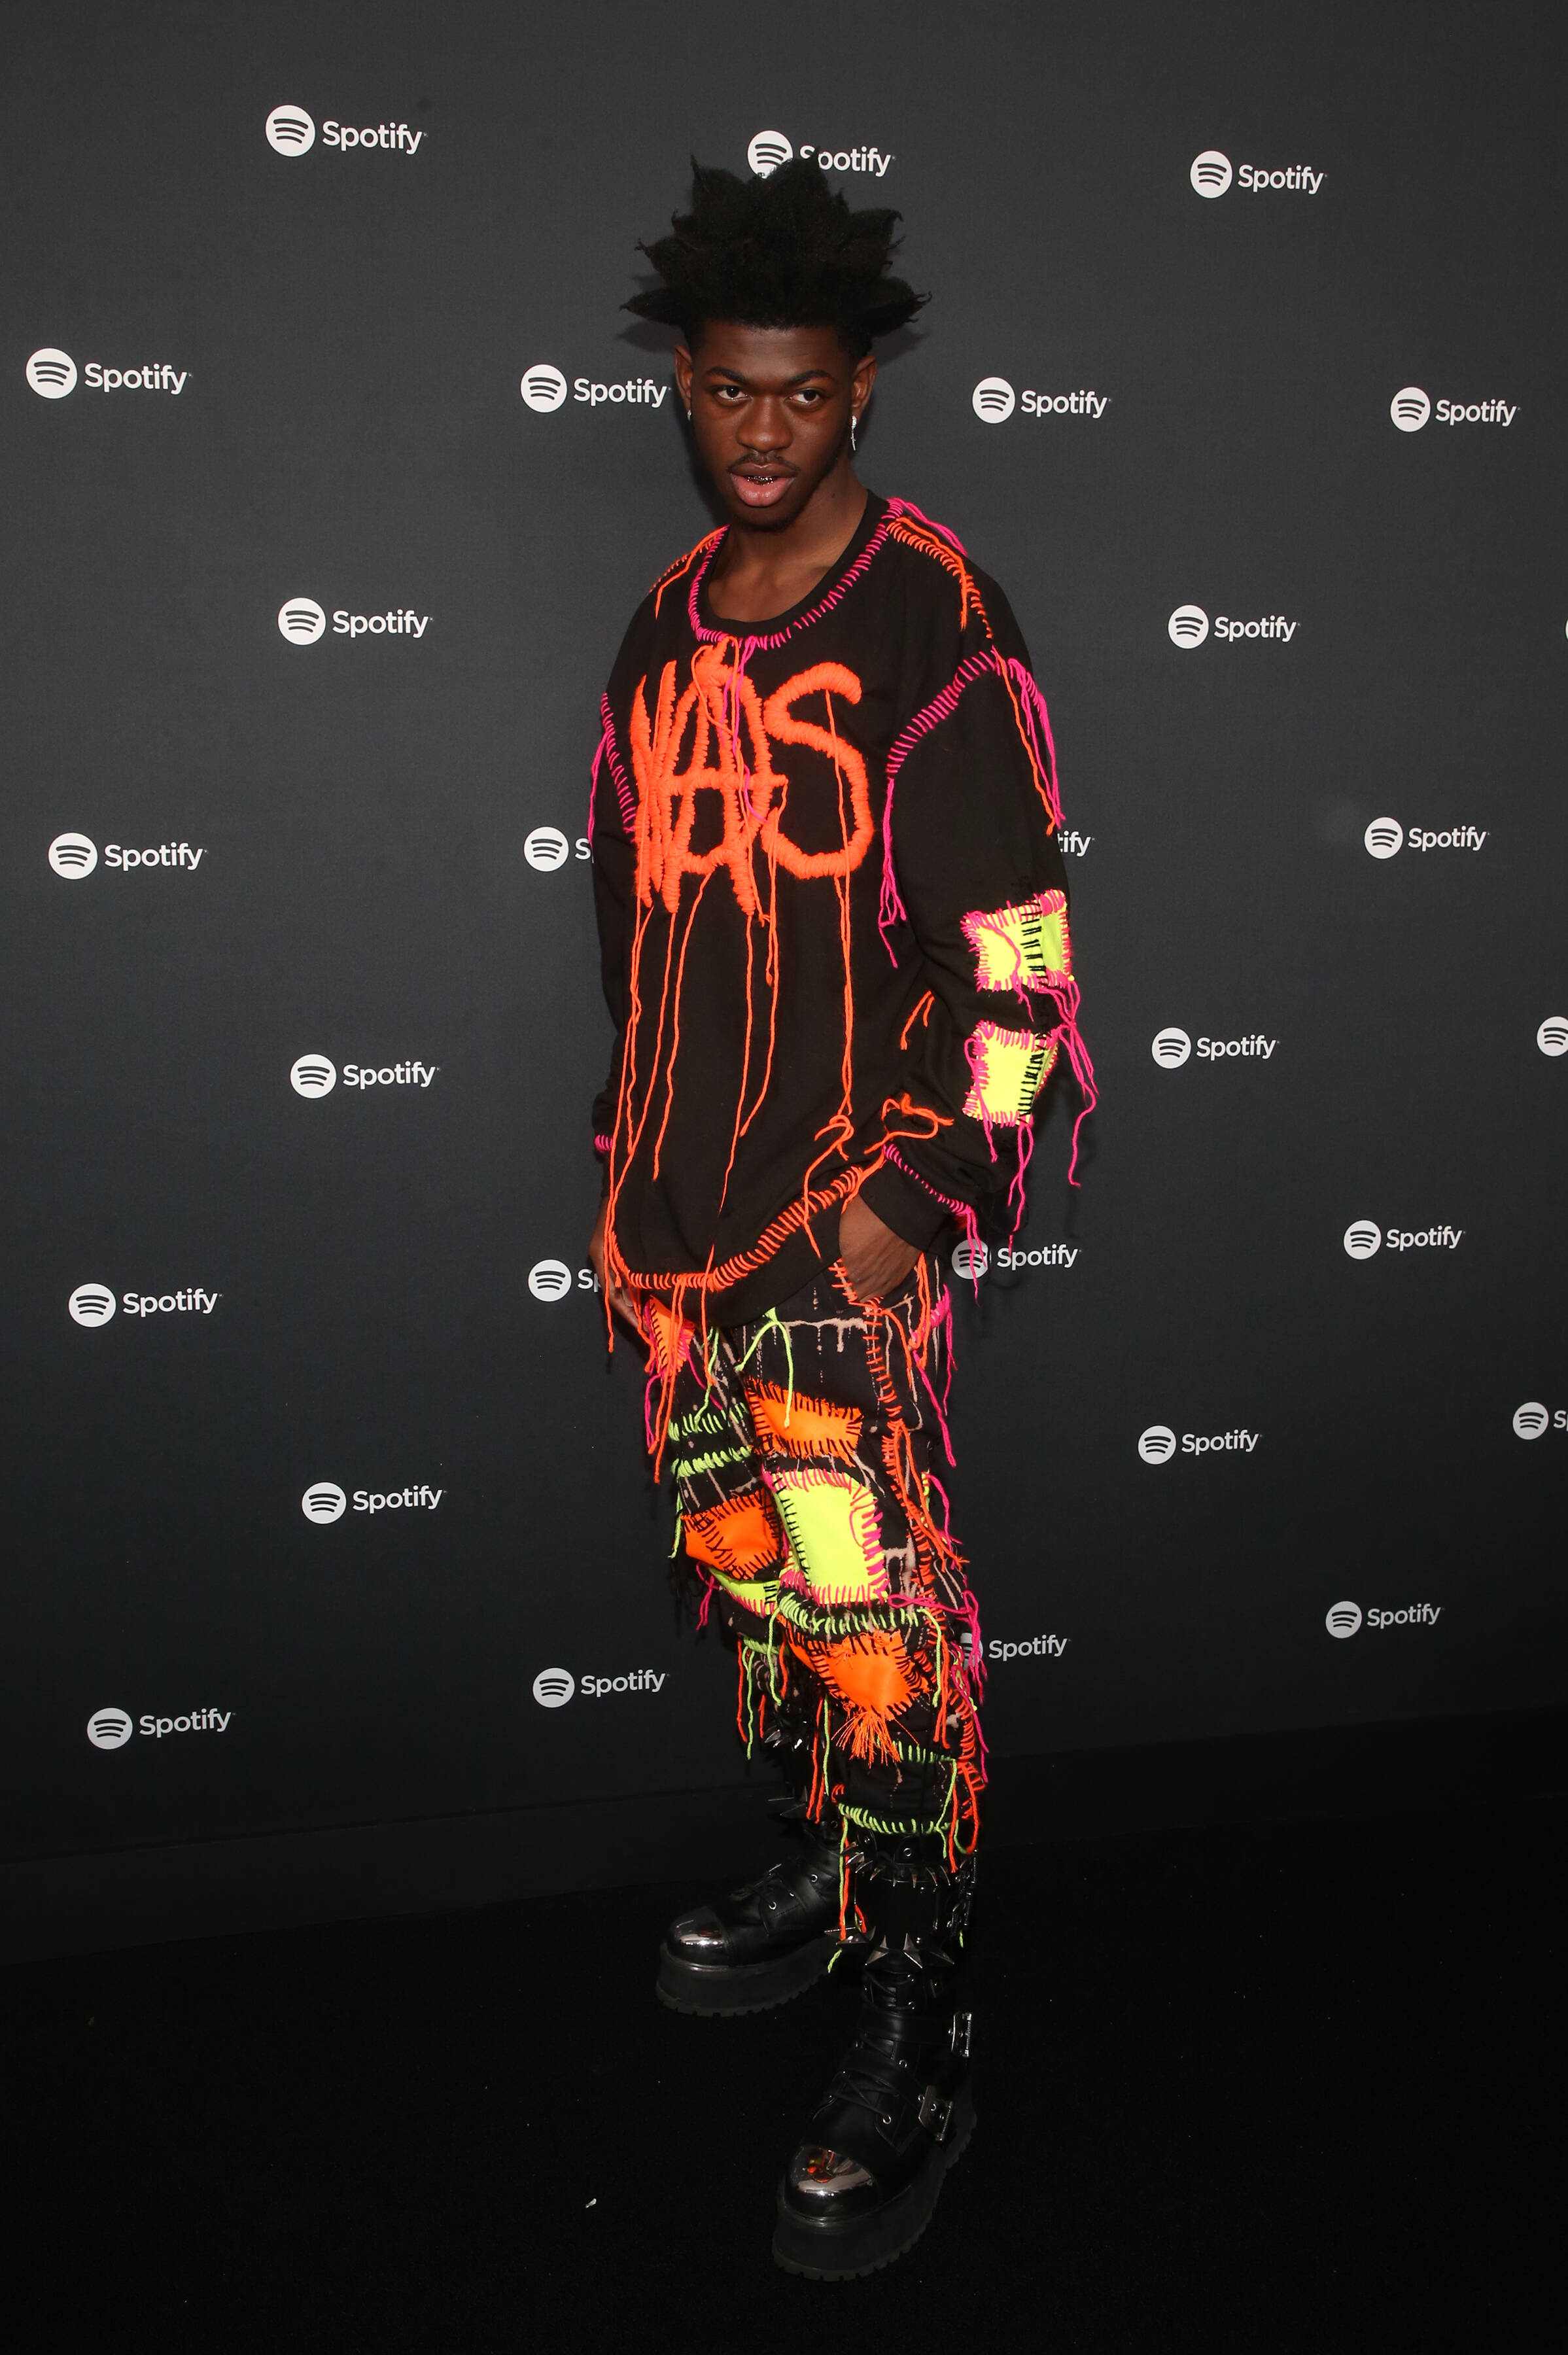 На вечеринке Spotify, 2020